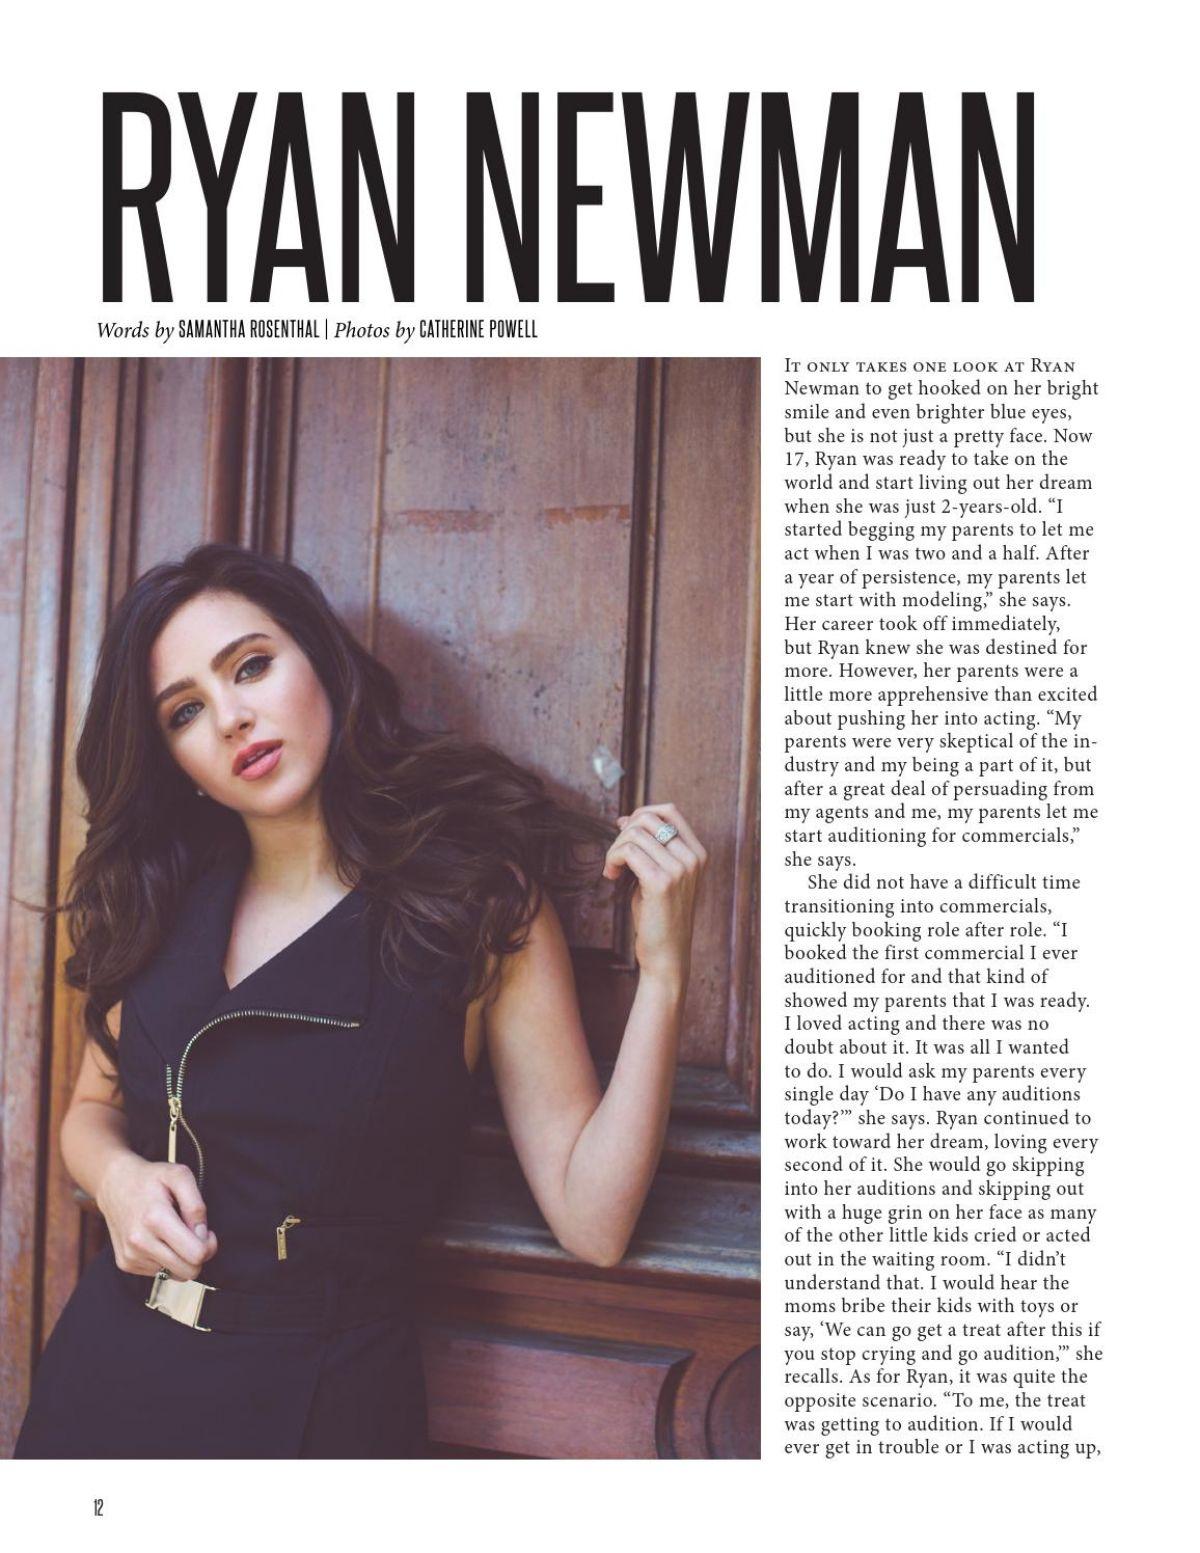 RYAN NEWMAN in NKD Magazine, November 2015 Issue